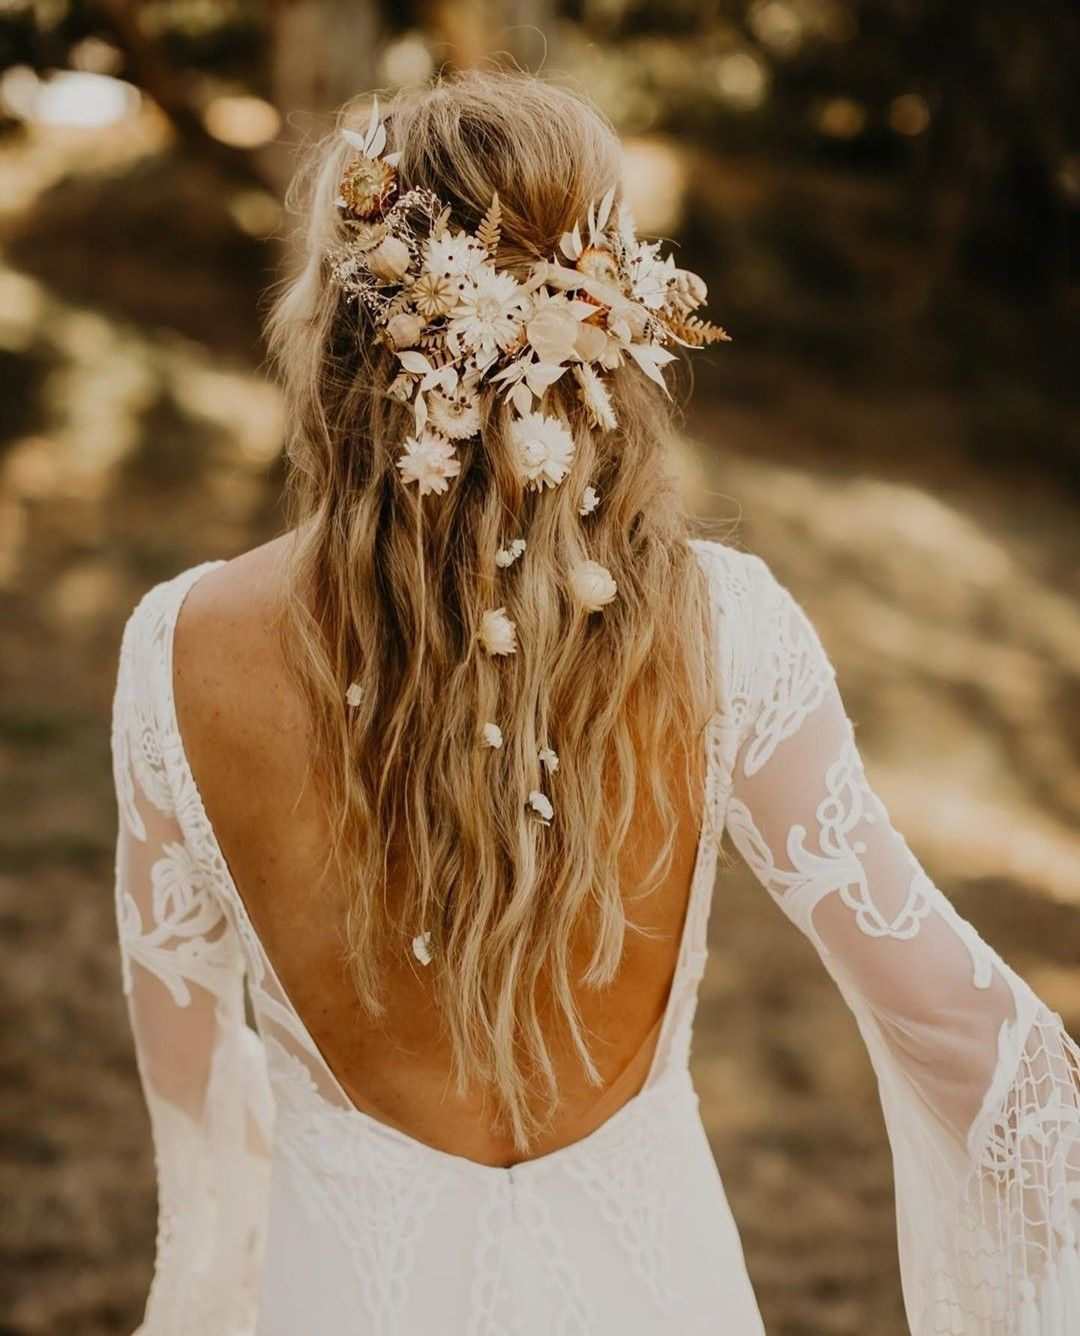 Photo of Blush Flowers Hair Comb / Natural Bridal Hair Accessory / Dry Flowers Silver comb / Bridal Hair comb / White Ivory orange tones